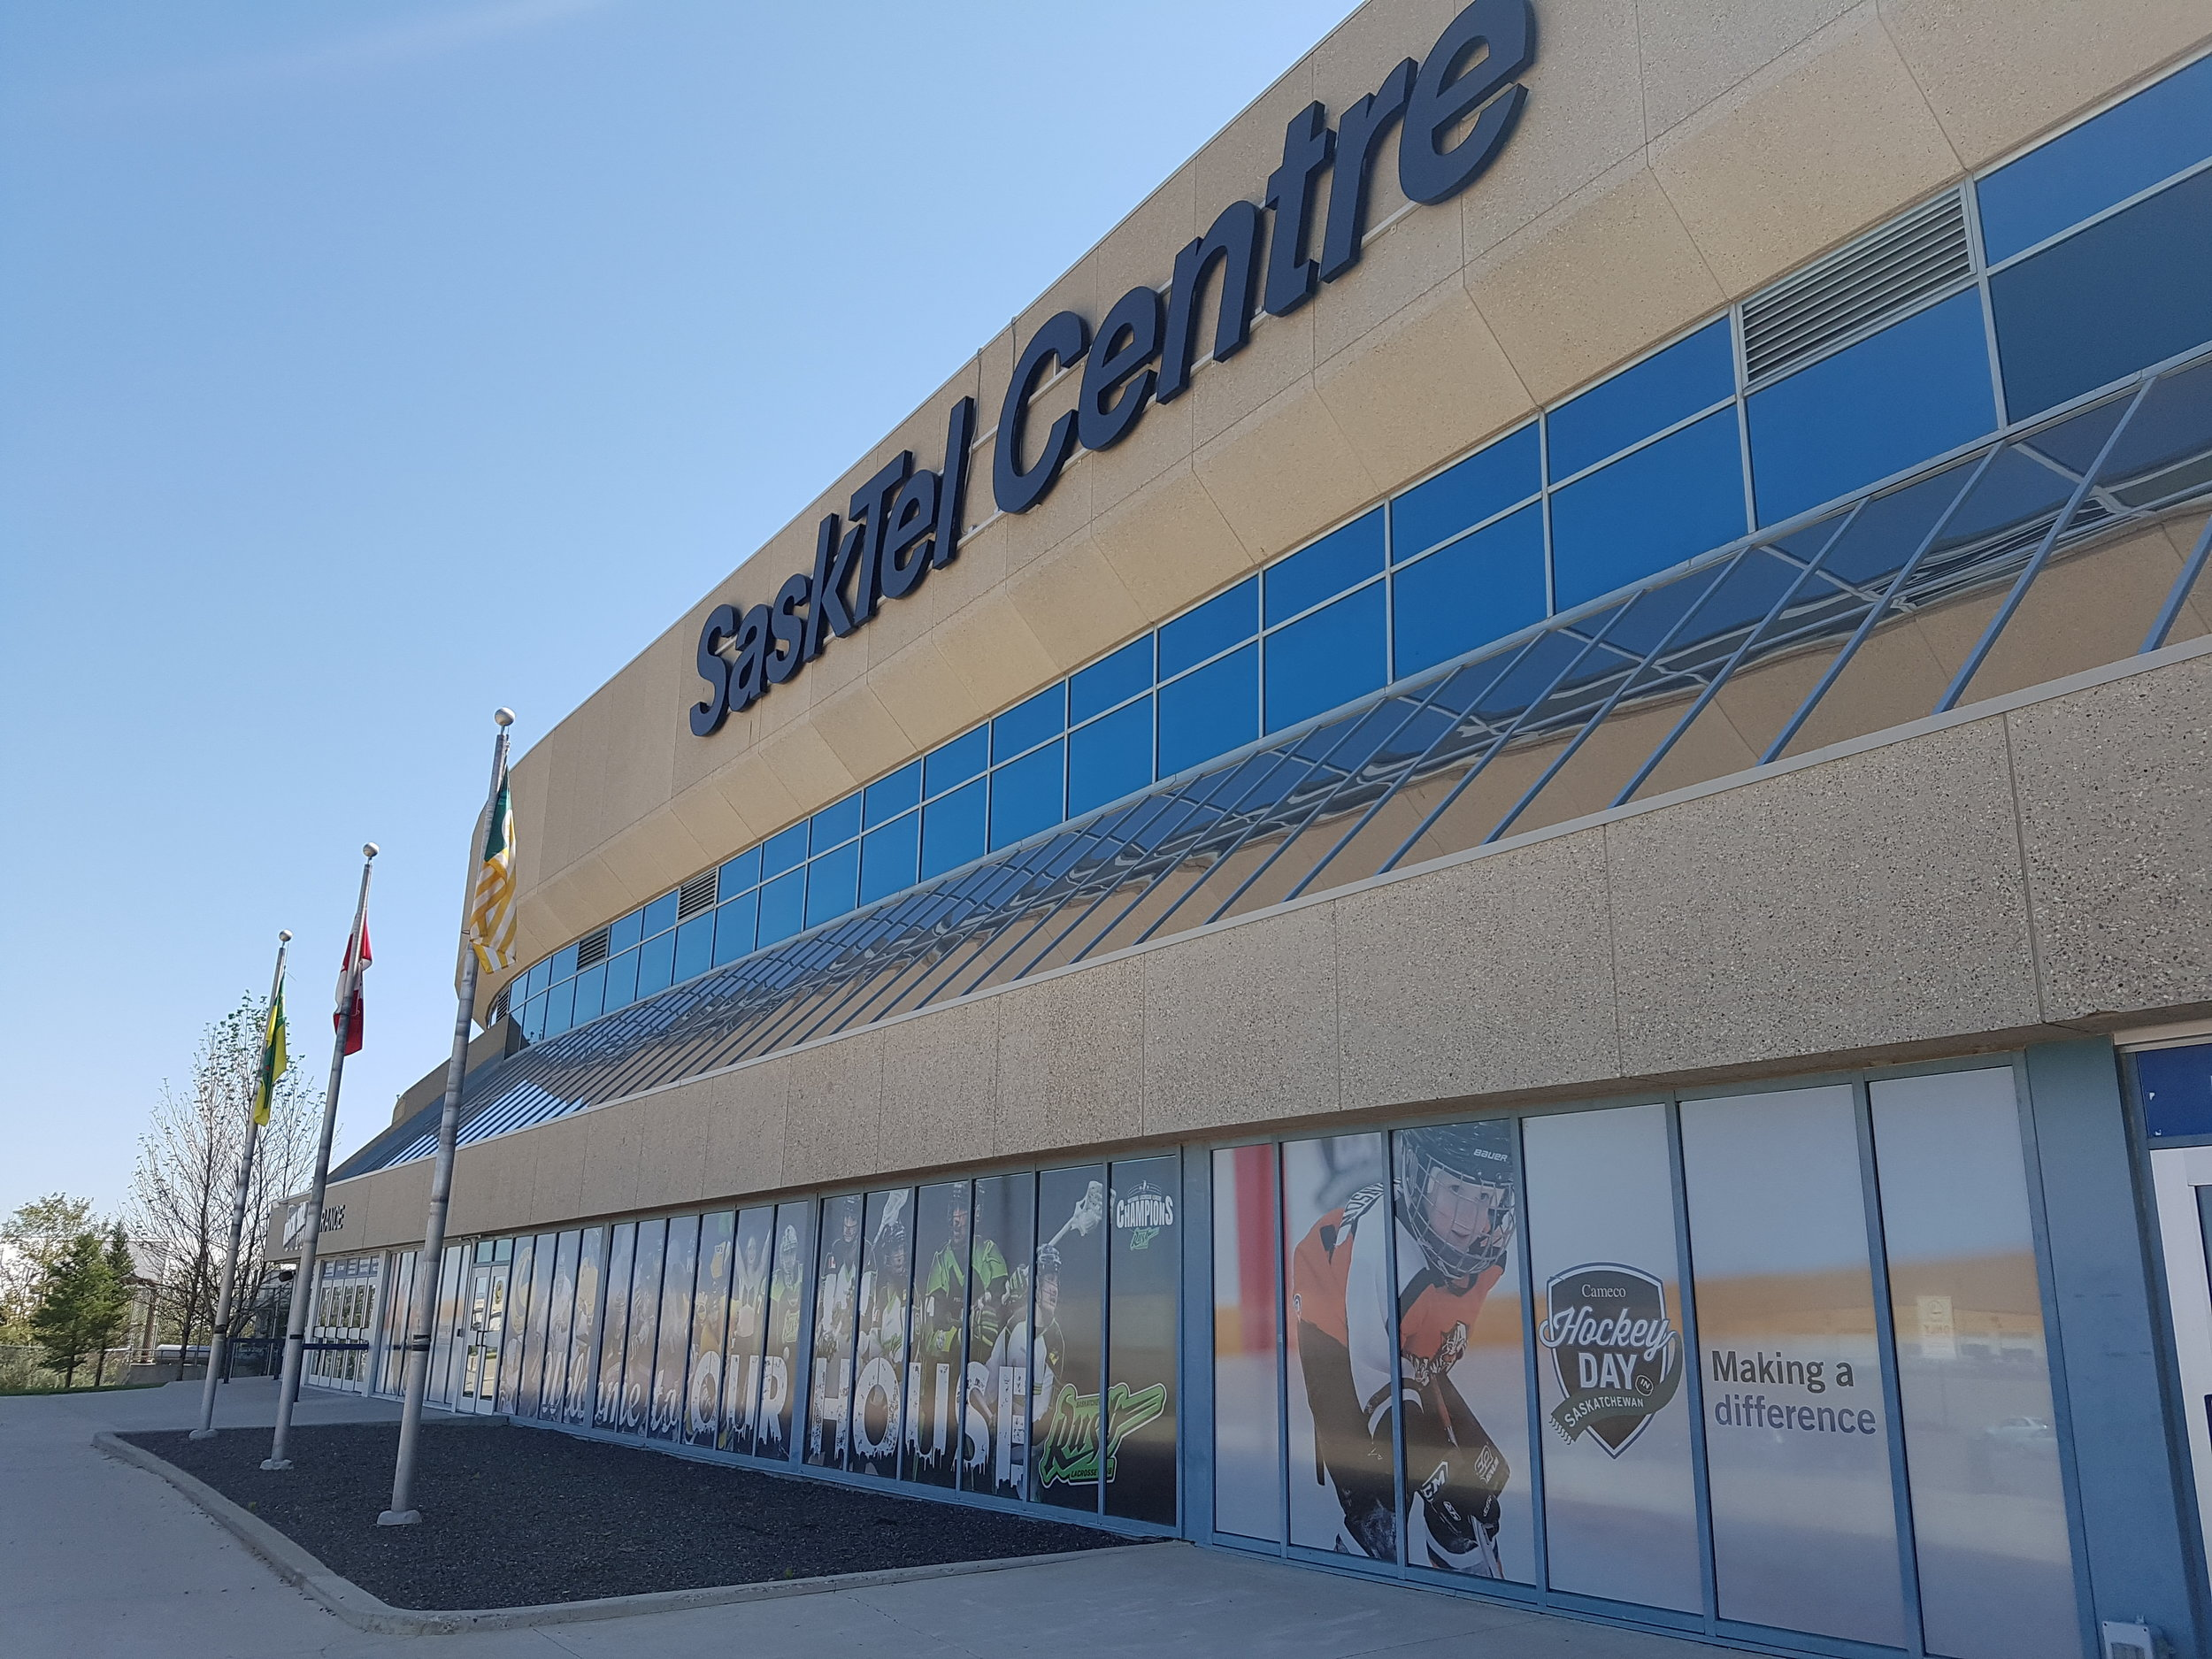 Sasktel Centre, Saskatoon